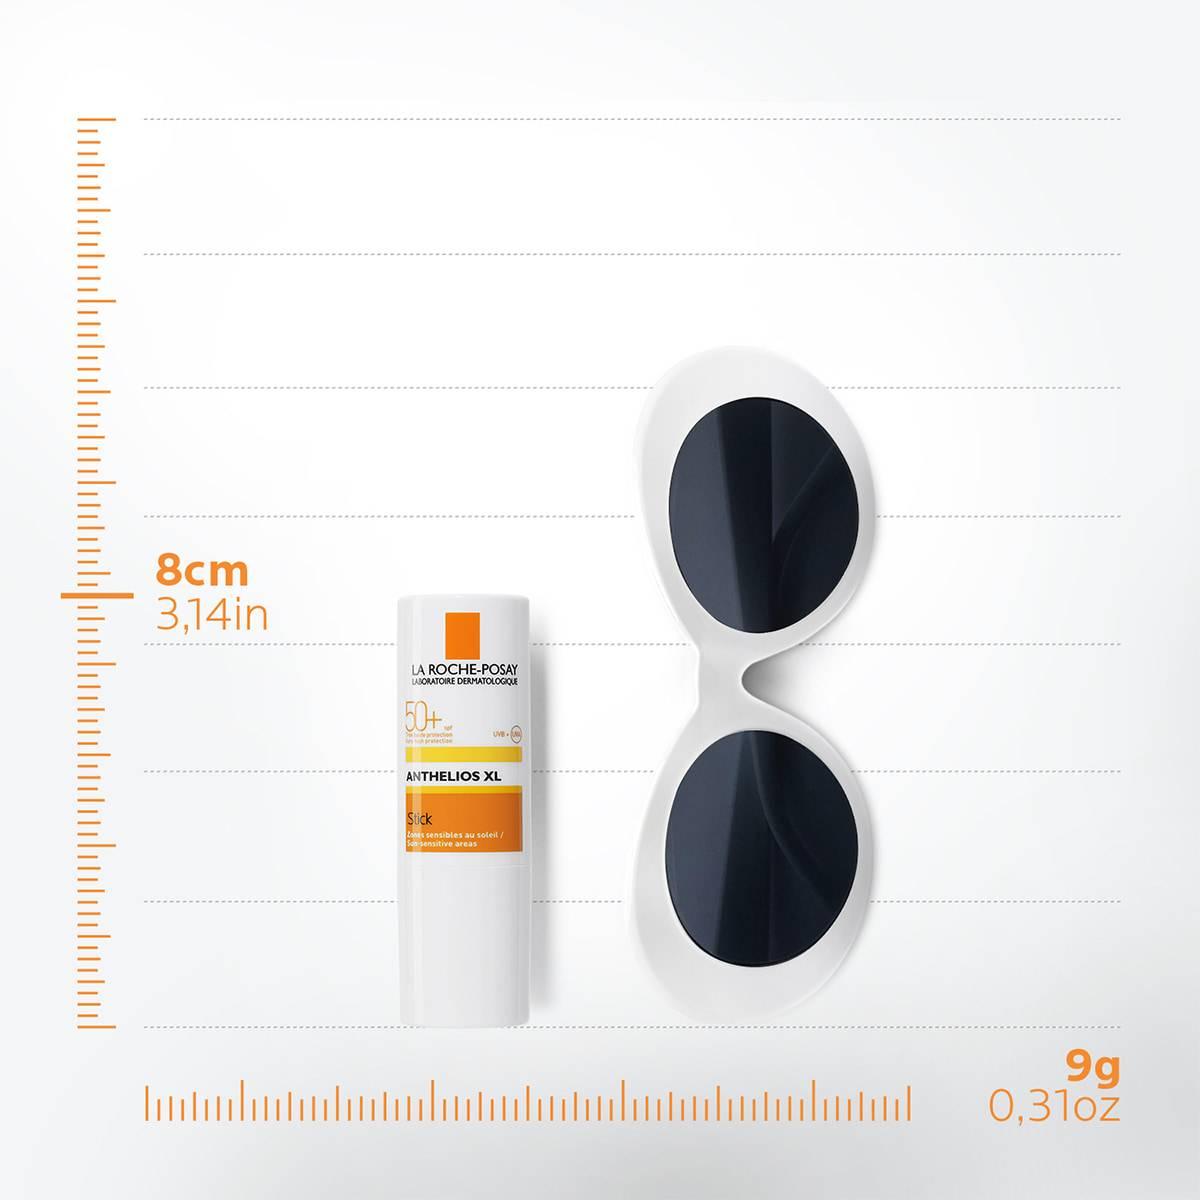 La Roche Posay ProduktSide Sol Anthelios XL Stick Sensitiv Område Spf50